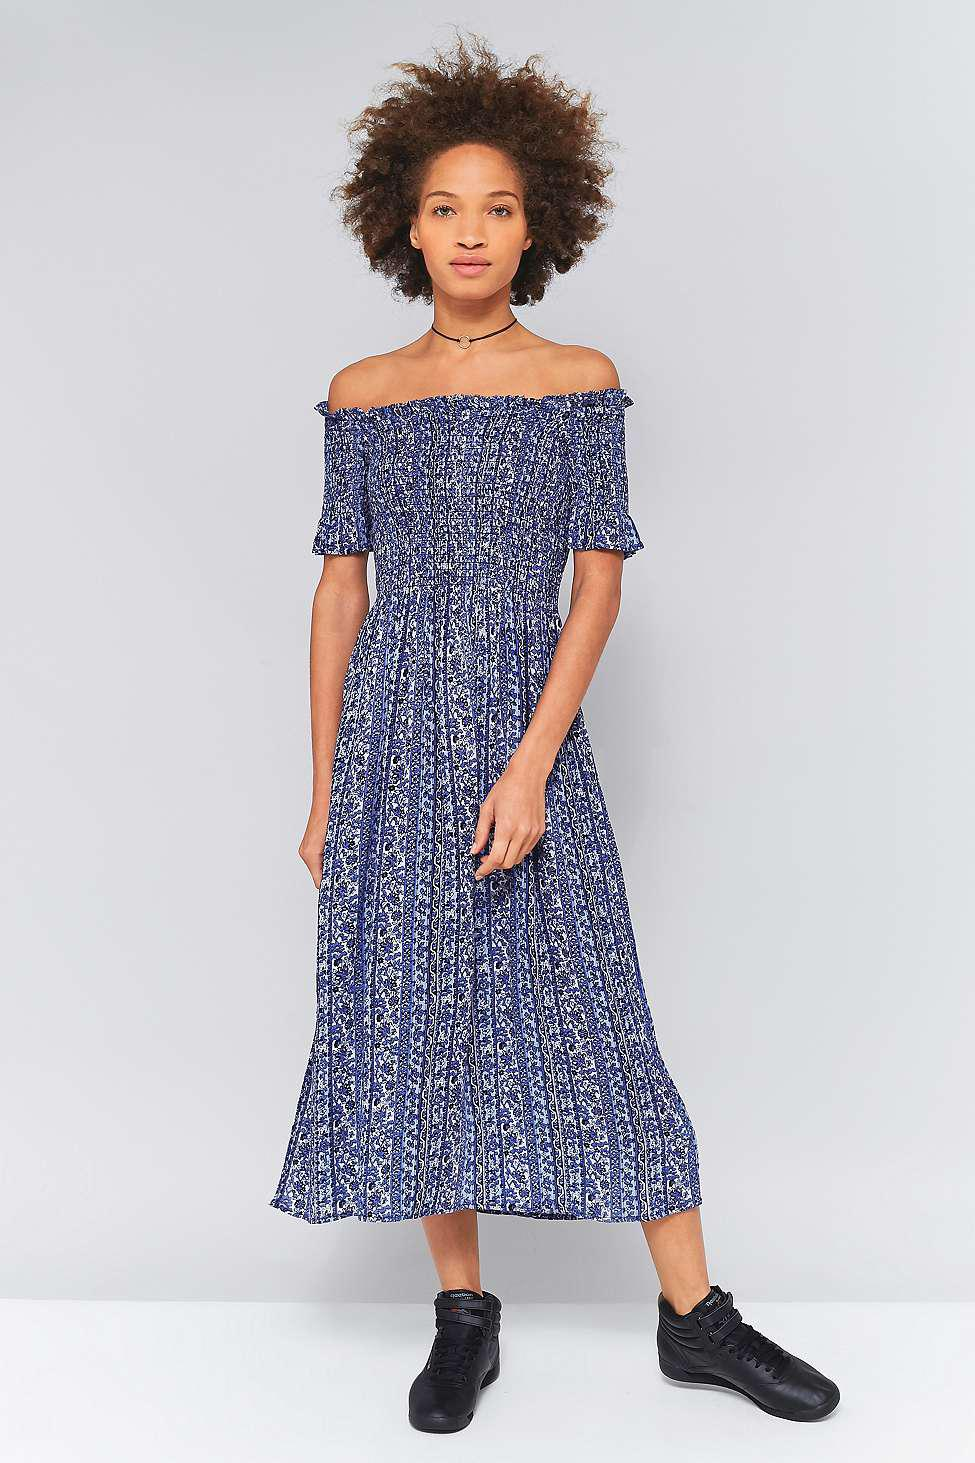 5ac47a65a3e0 Kimchi Blue Picnic Blue Floral Smocked Off-the-shoulder Midi Dress ...